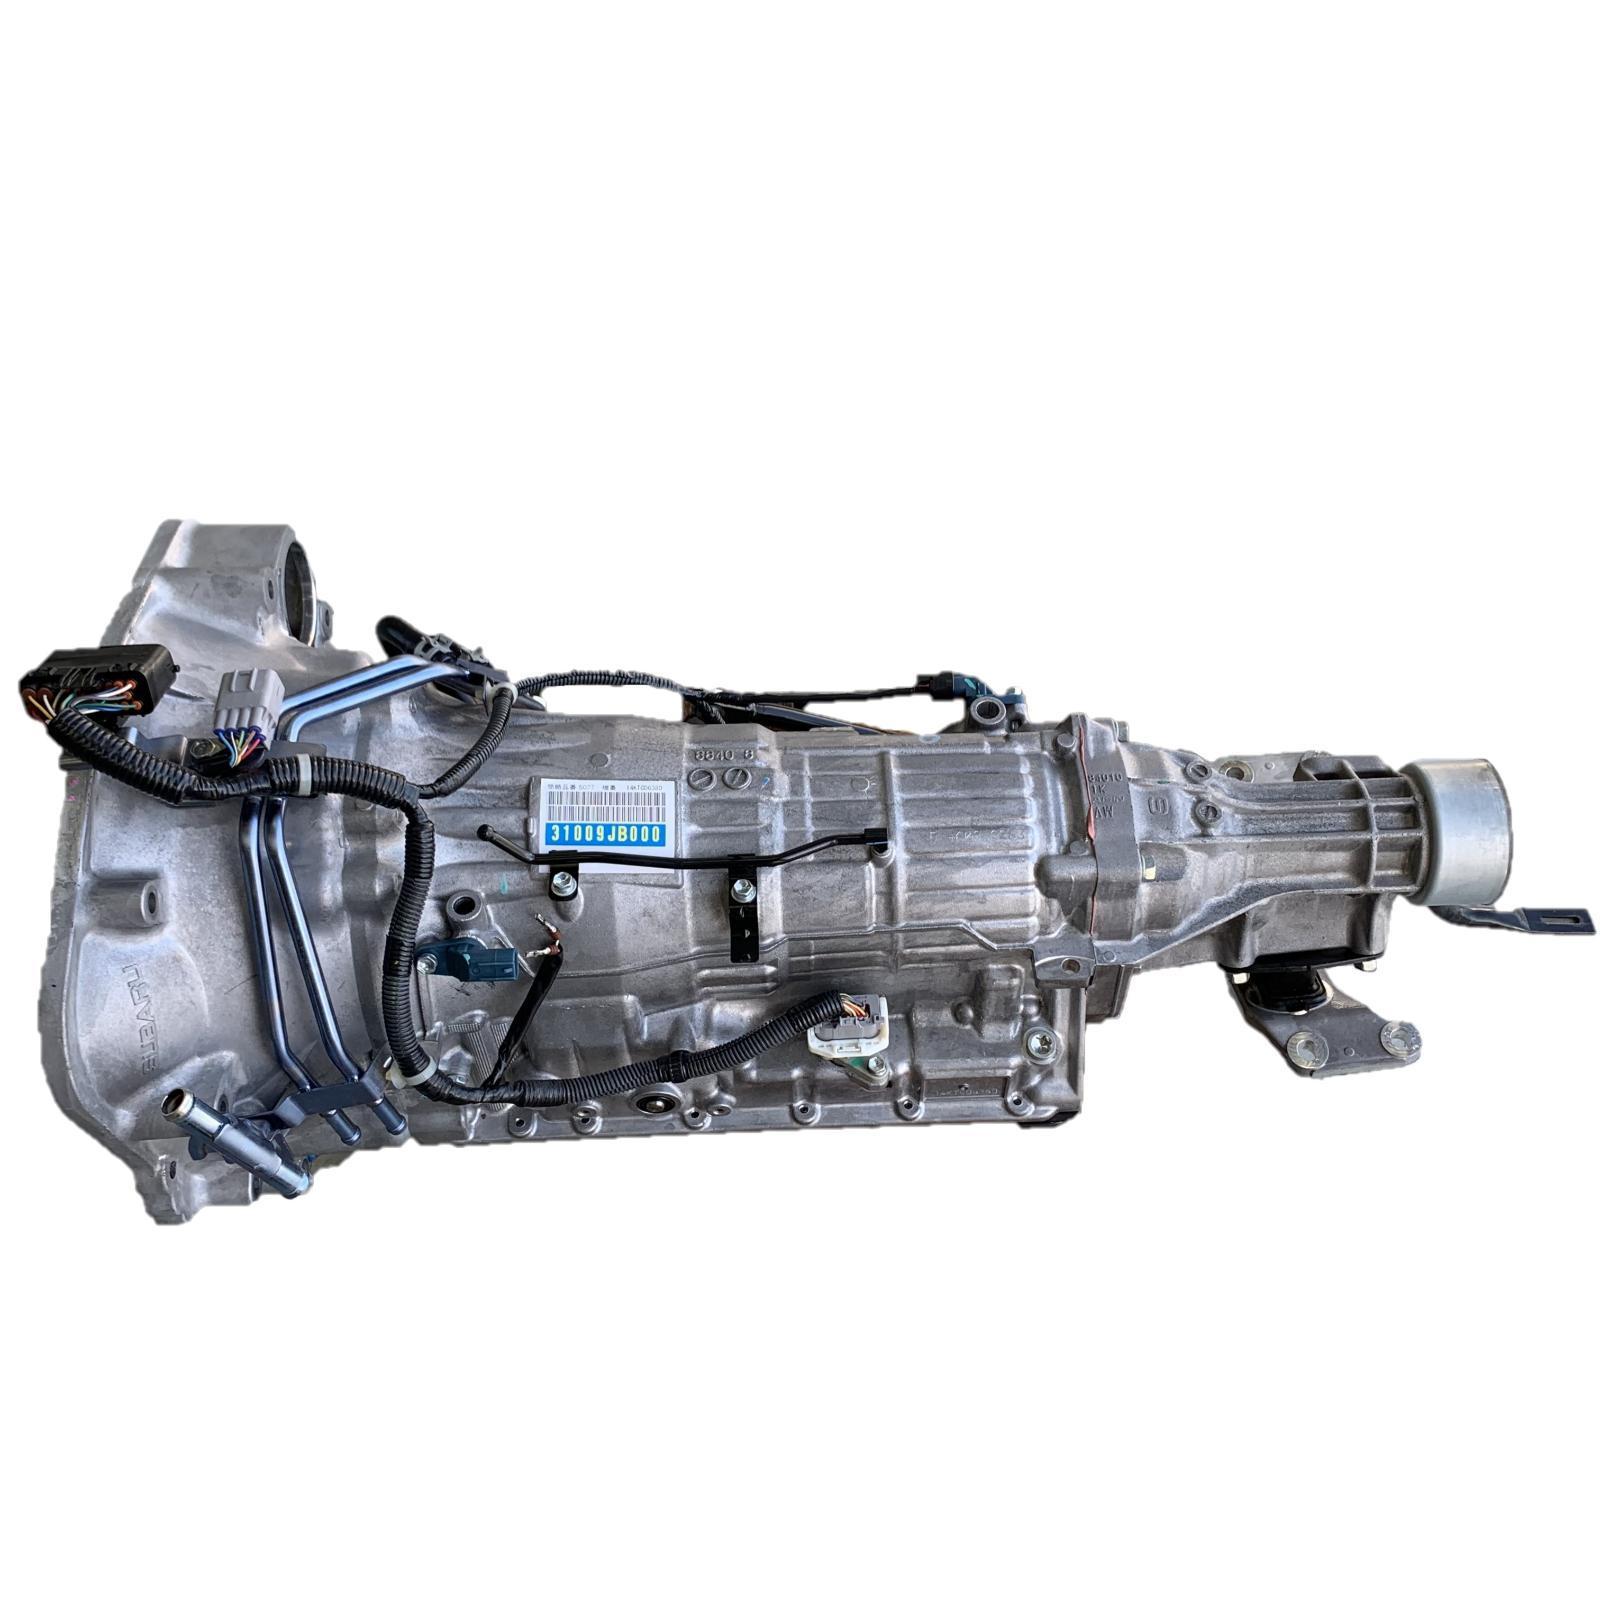 TOYOTA 86, Trans/Gearbox, AUTO, PETROL, 2.0, FA20, ZN6, 06/12-